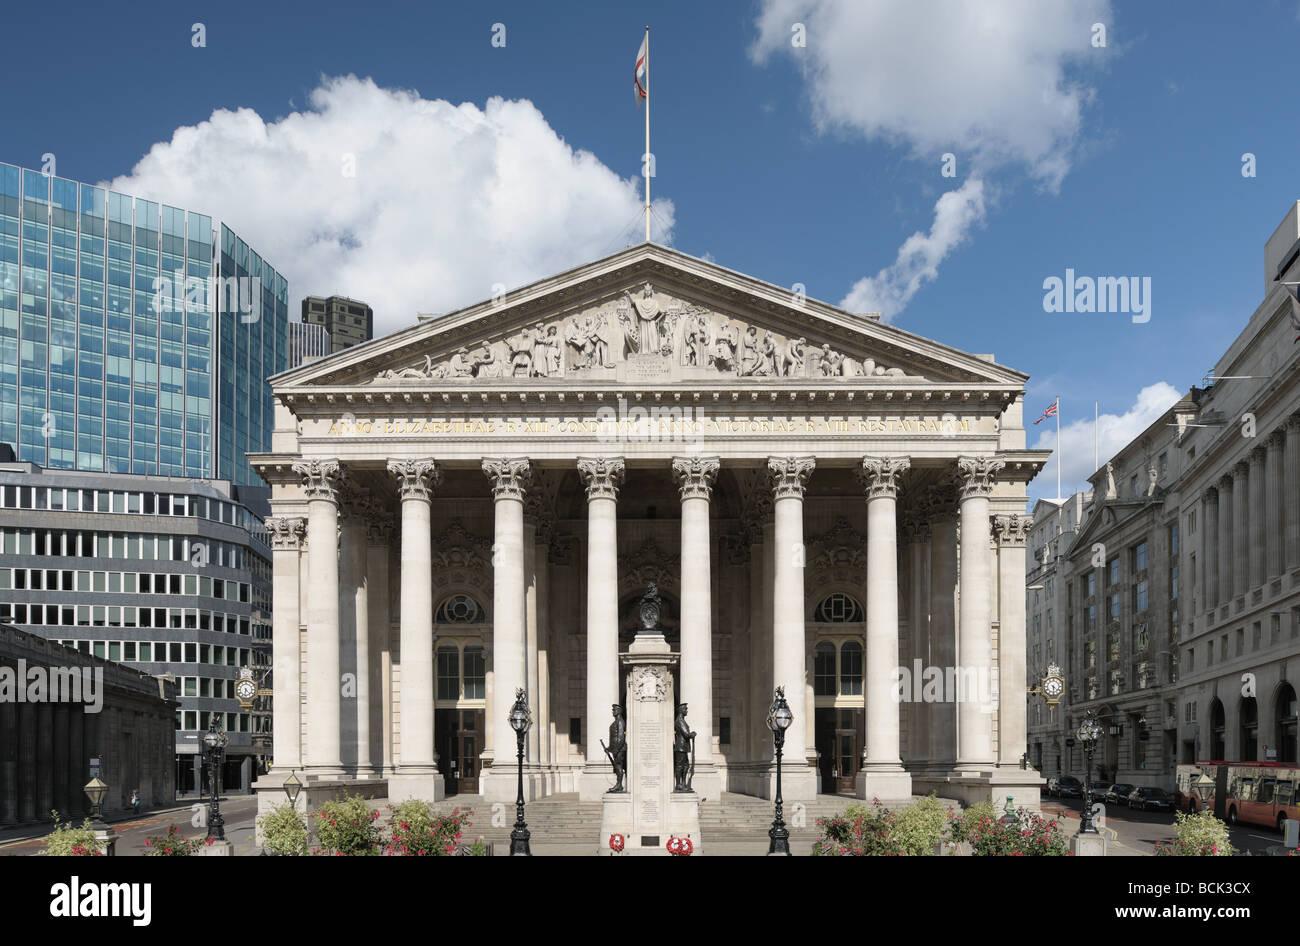 Royal Exchange London England UK Europe now a luxury shopping centre - Stock Image